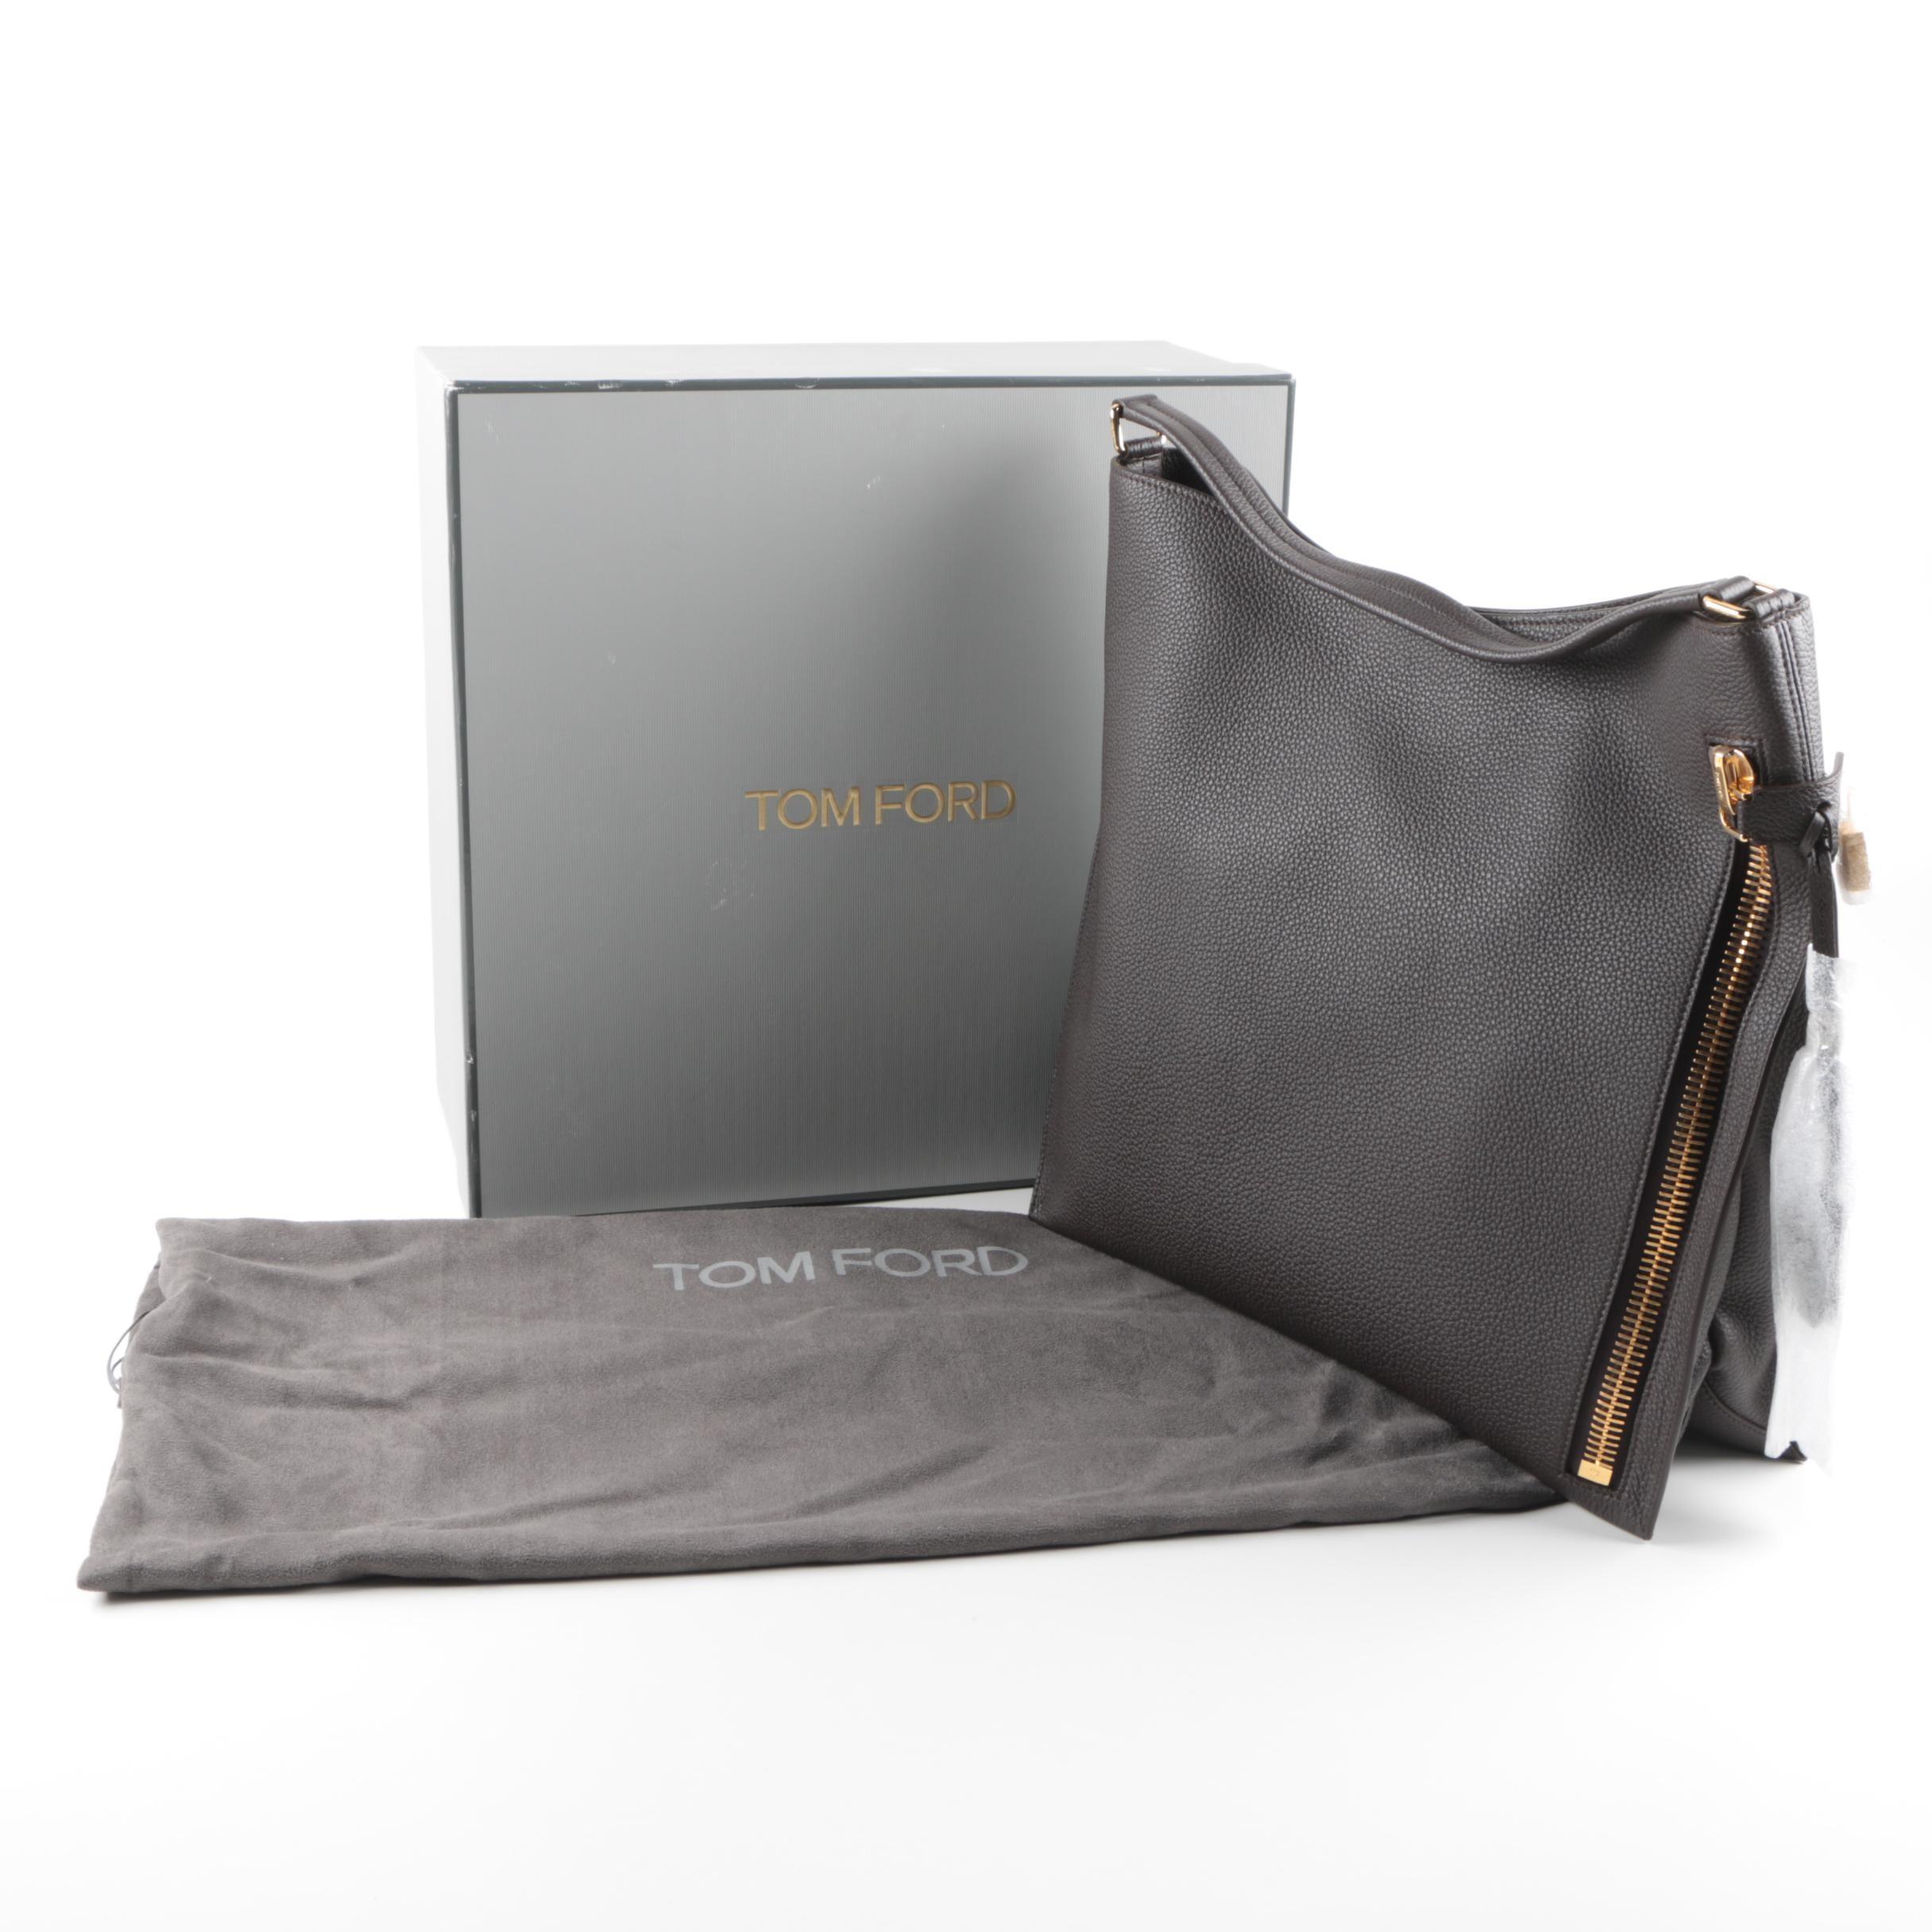 Tom Ford Brown Pebbled Leather Handbag